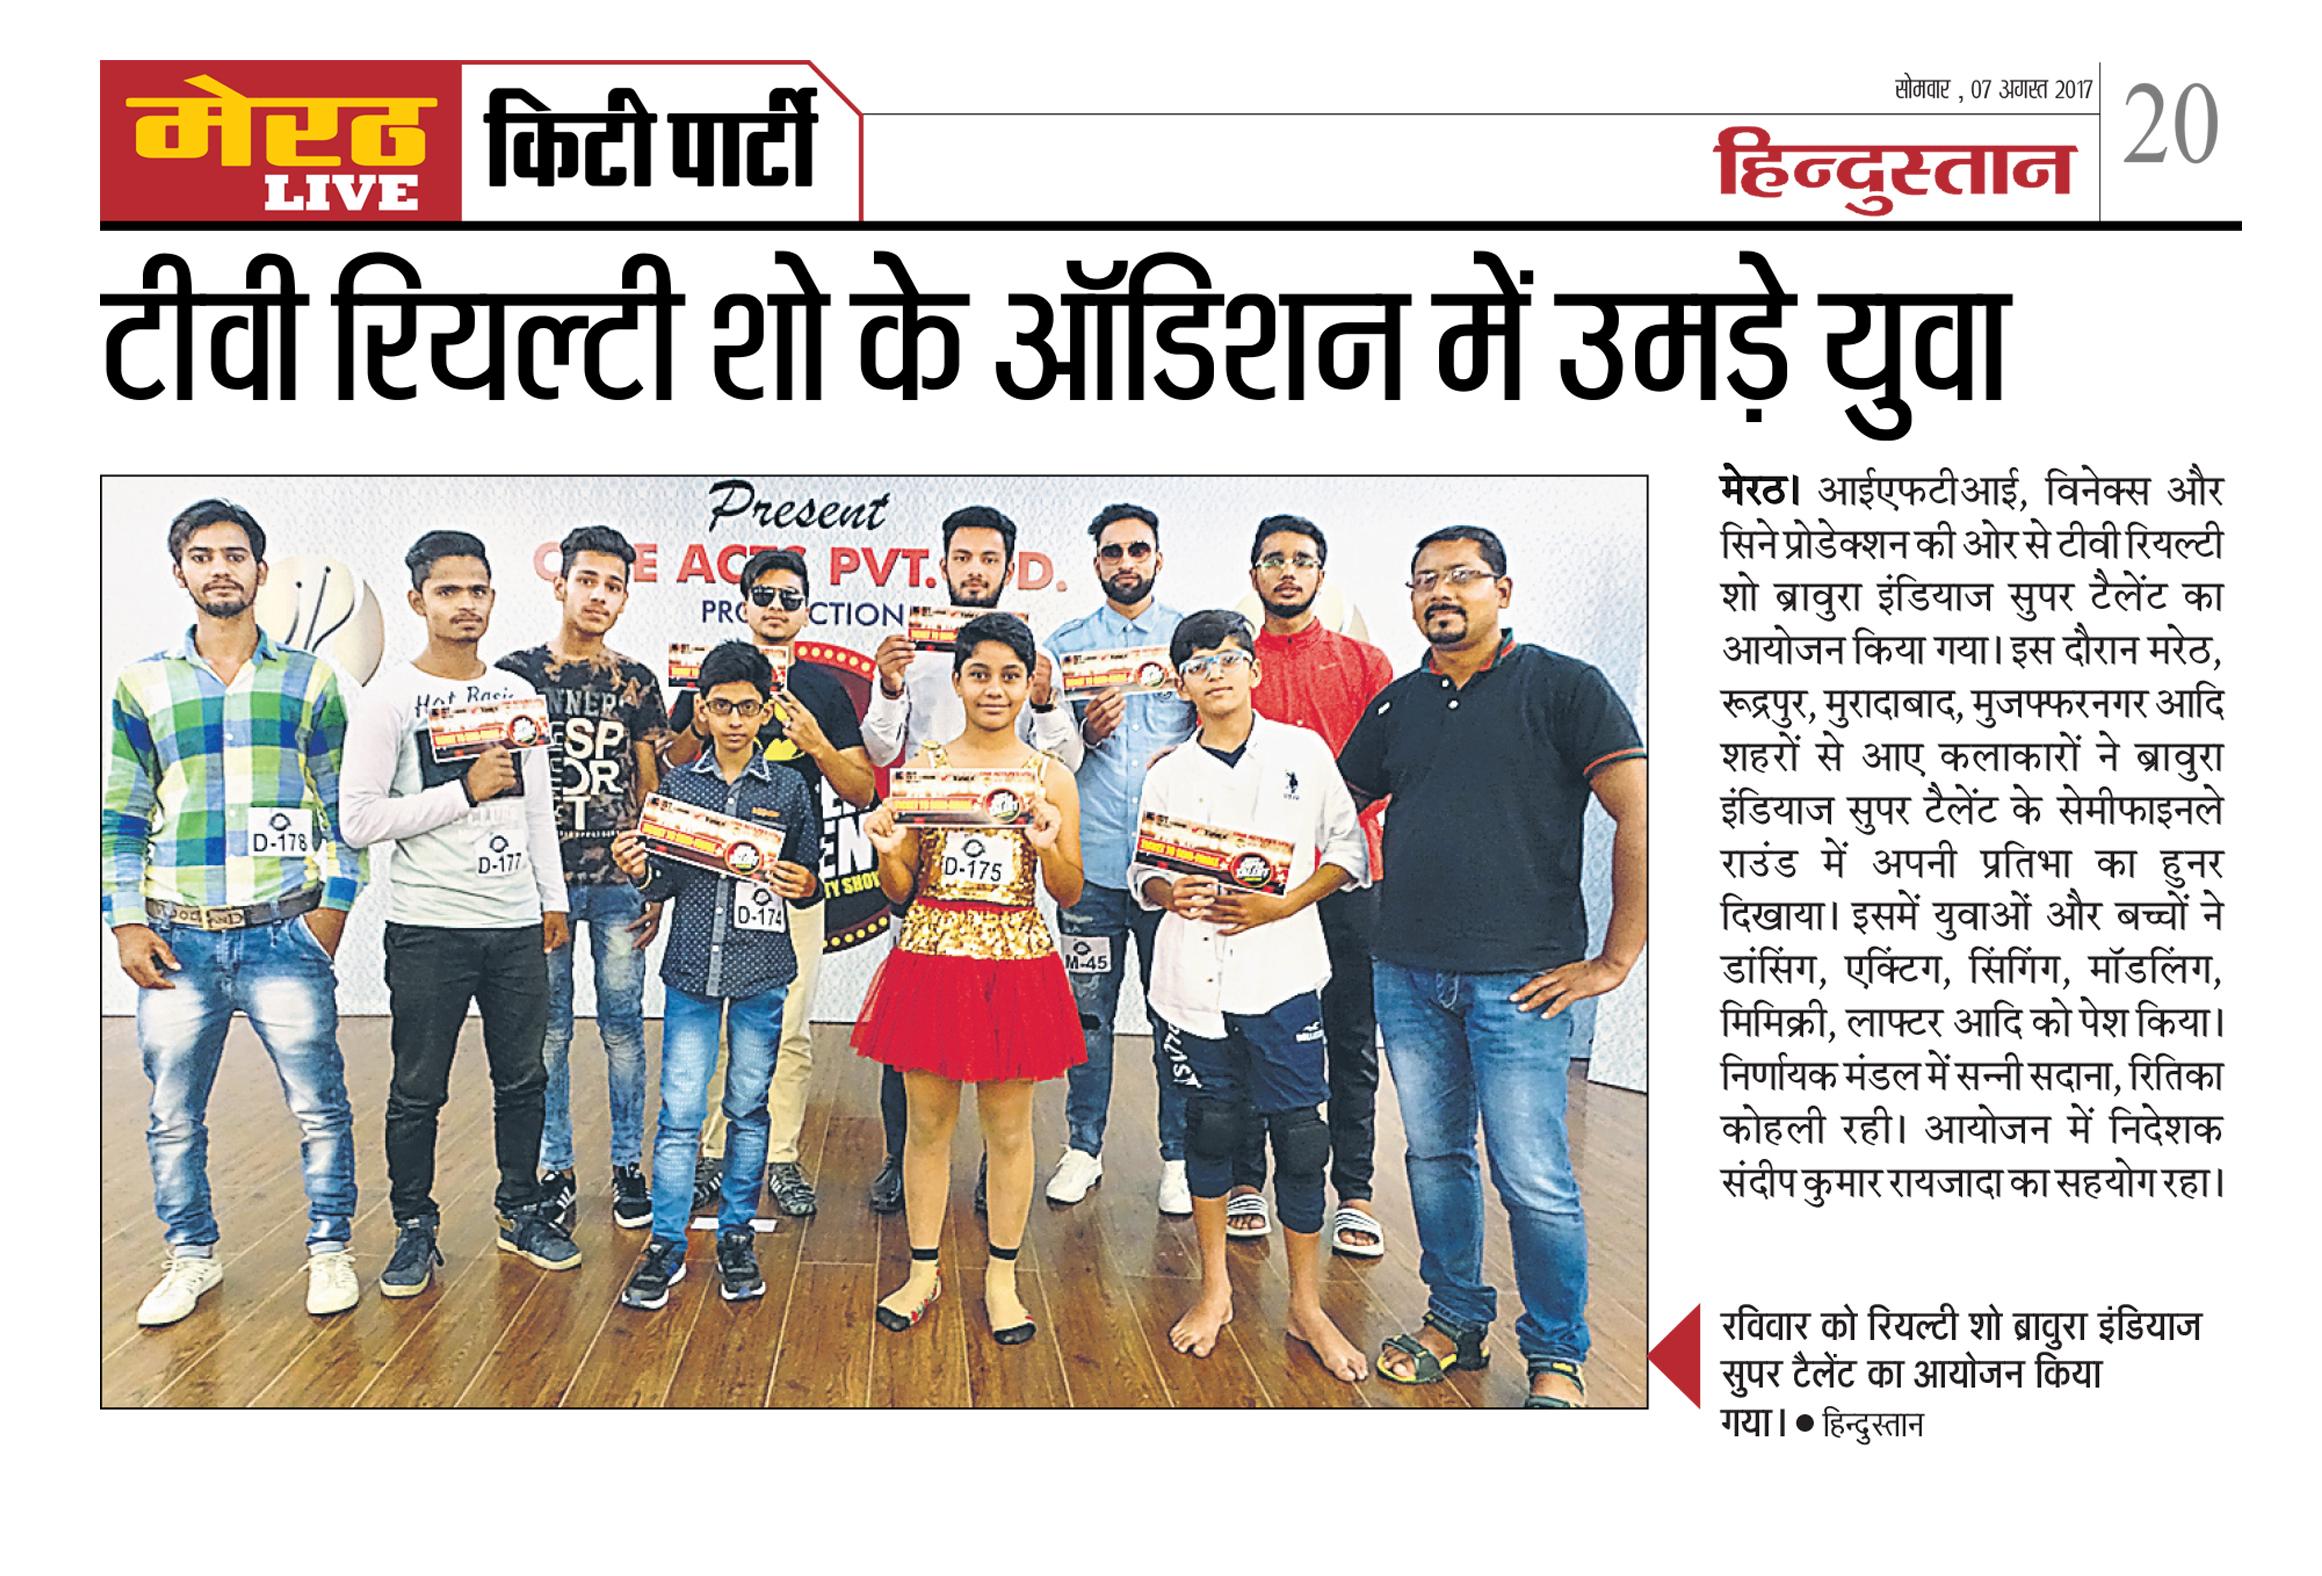 Bravura India's Super Talent Hindustan